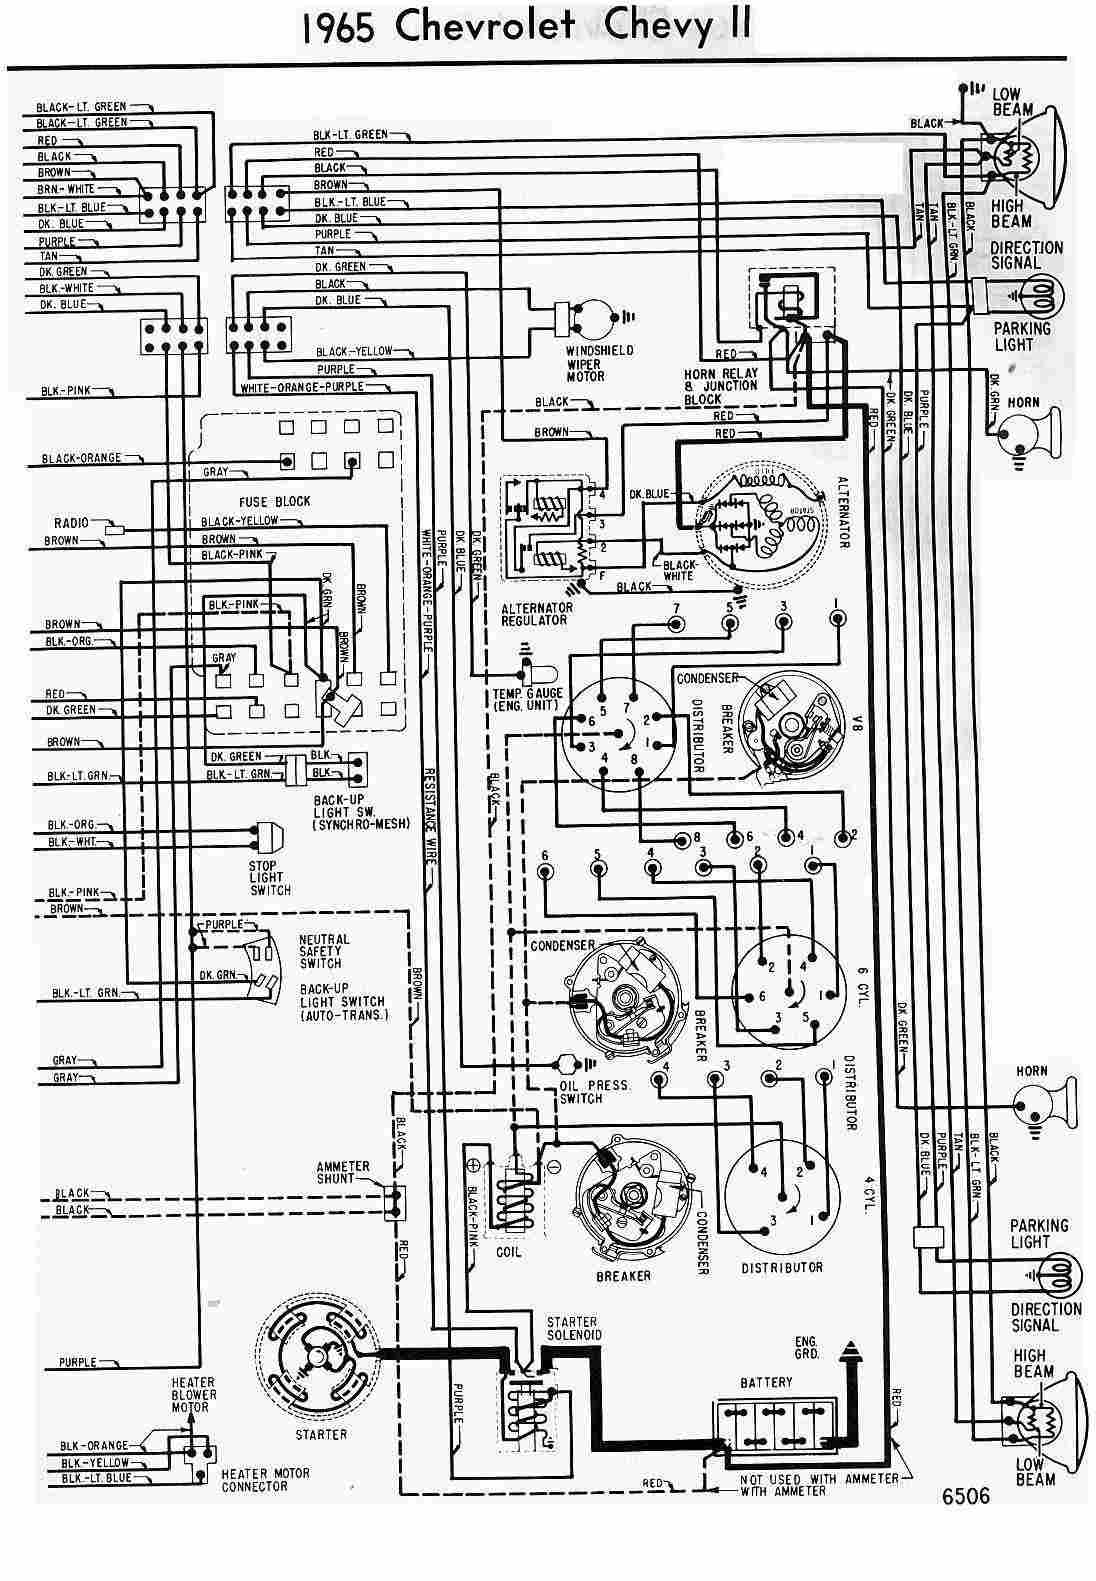 hight resolution of 1976 corvette dash wiring diagram schematic simple wiring diagramswiring diagram 1964 chevy corvette wiring diagrams 1977